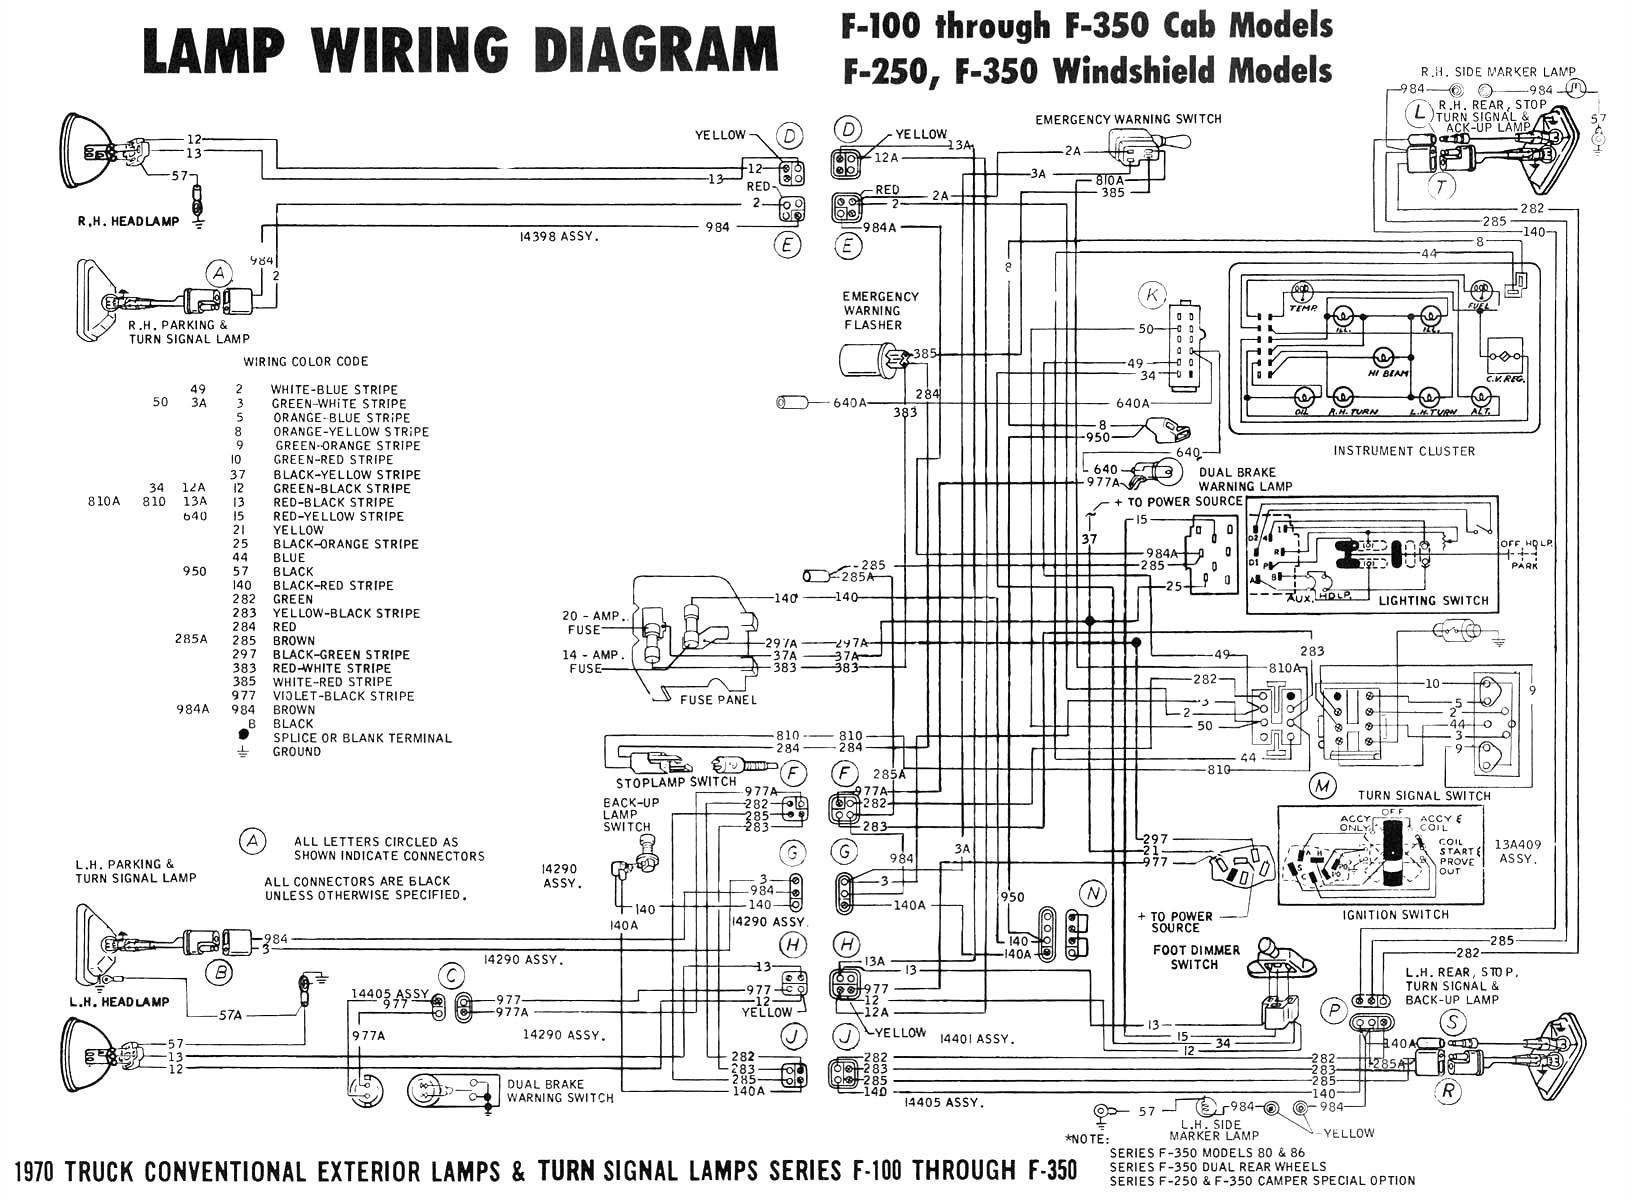 2005 ford f350 alternator wiring diagram wiring diagram toolbox ford f 350 super duty altenator wiring diagram